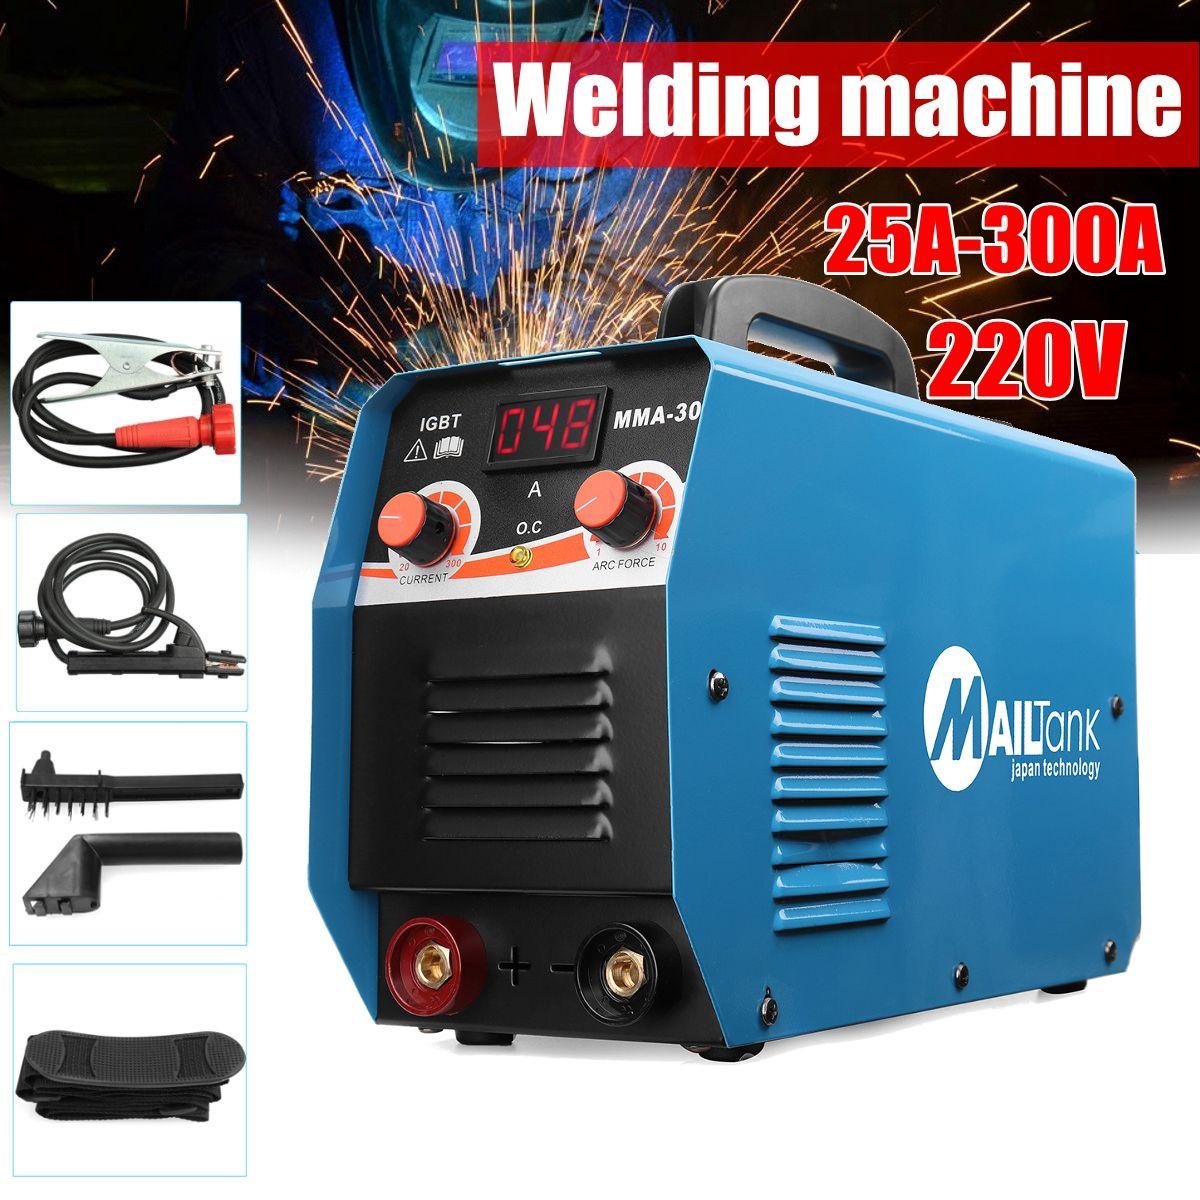 MMA-300G Mini Welders DC Welding Machine 220V 25A-300A Semi-Automatic Inverter LCD Soldering Tool